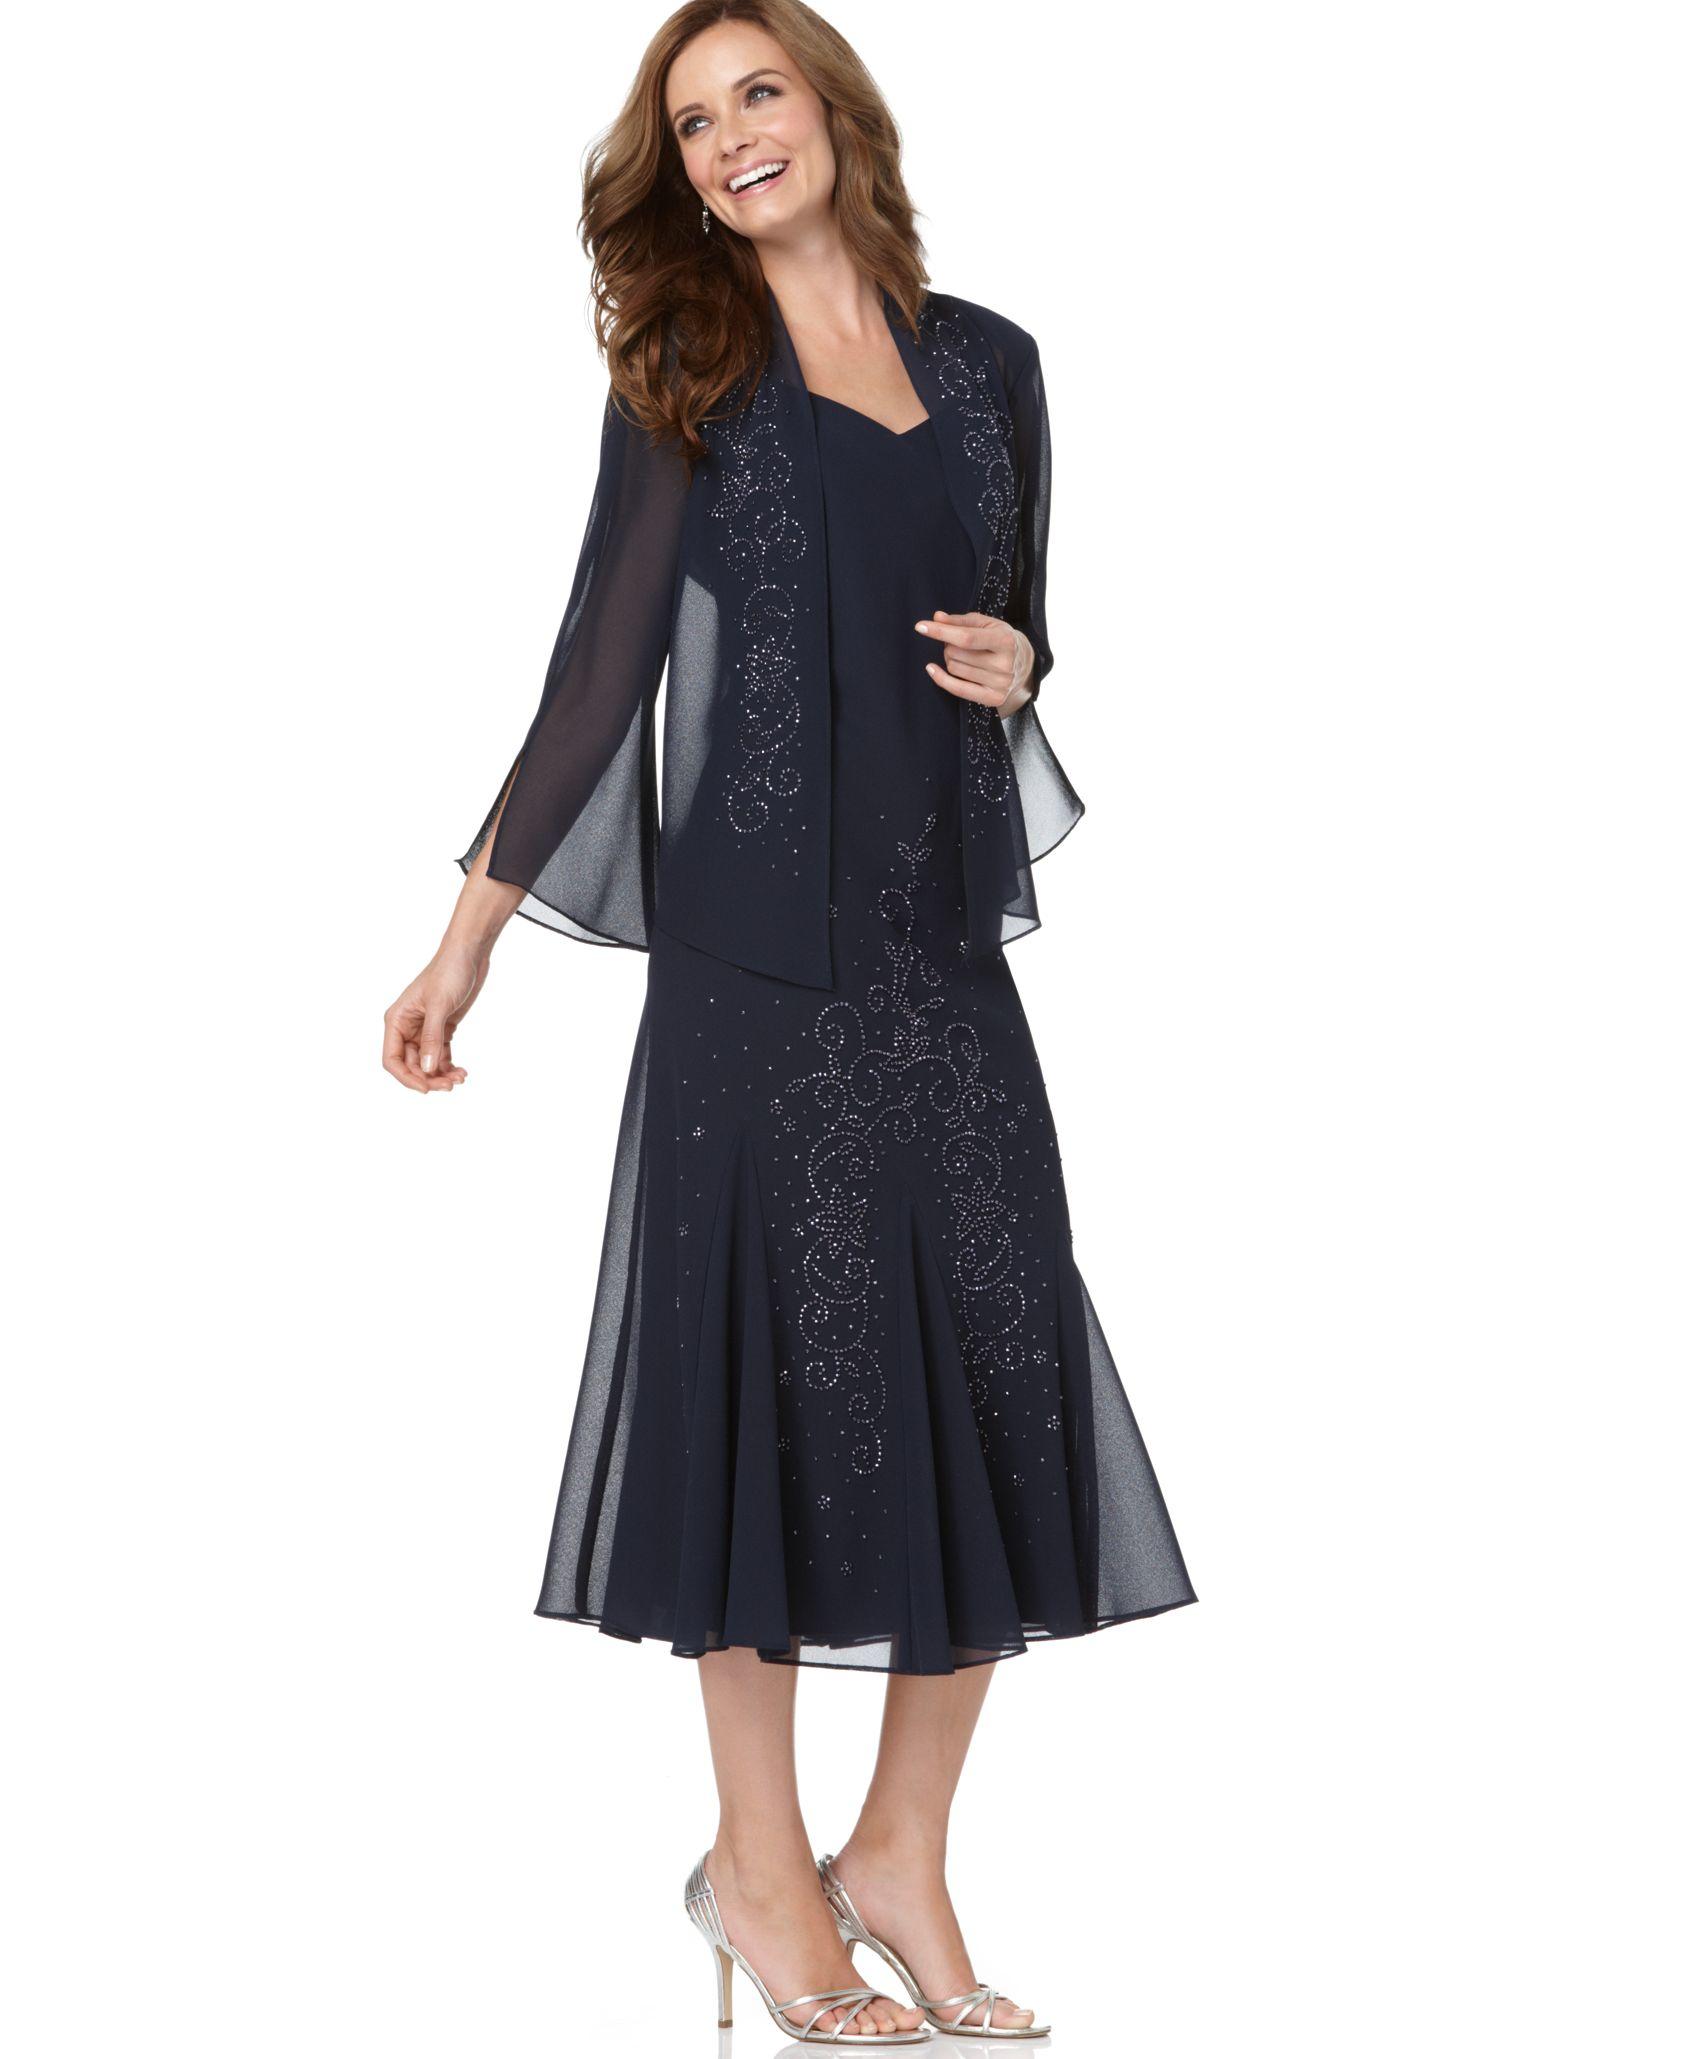 macys grey dresses photo - 1